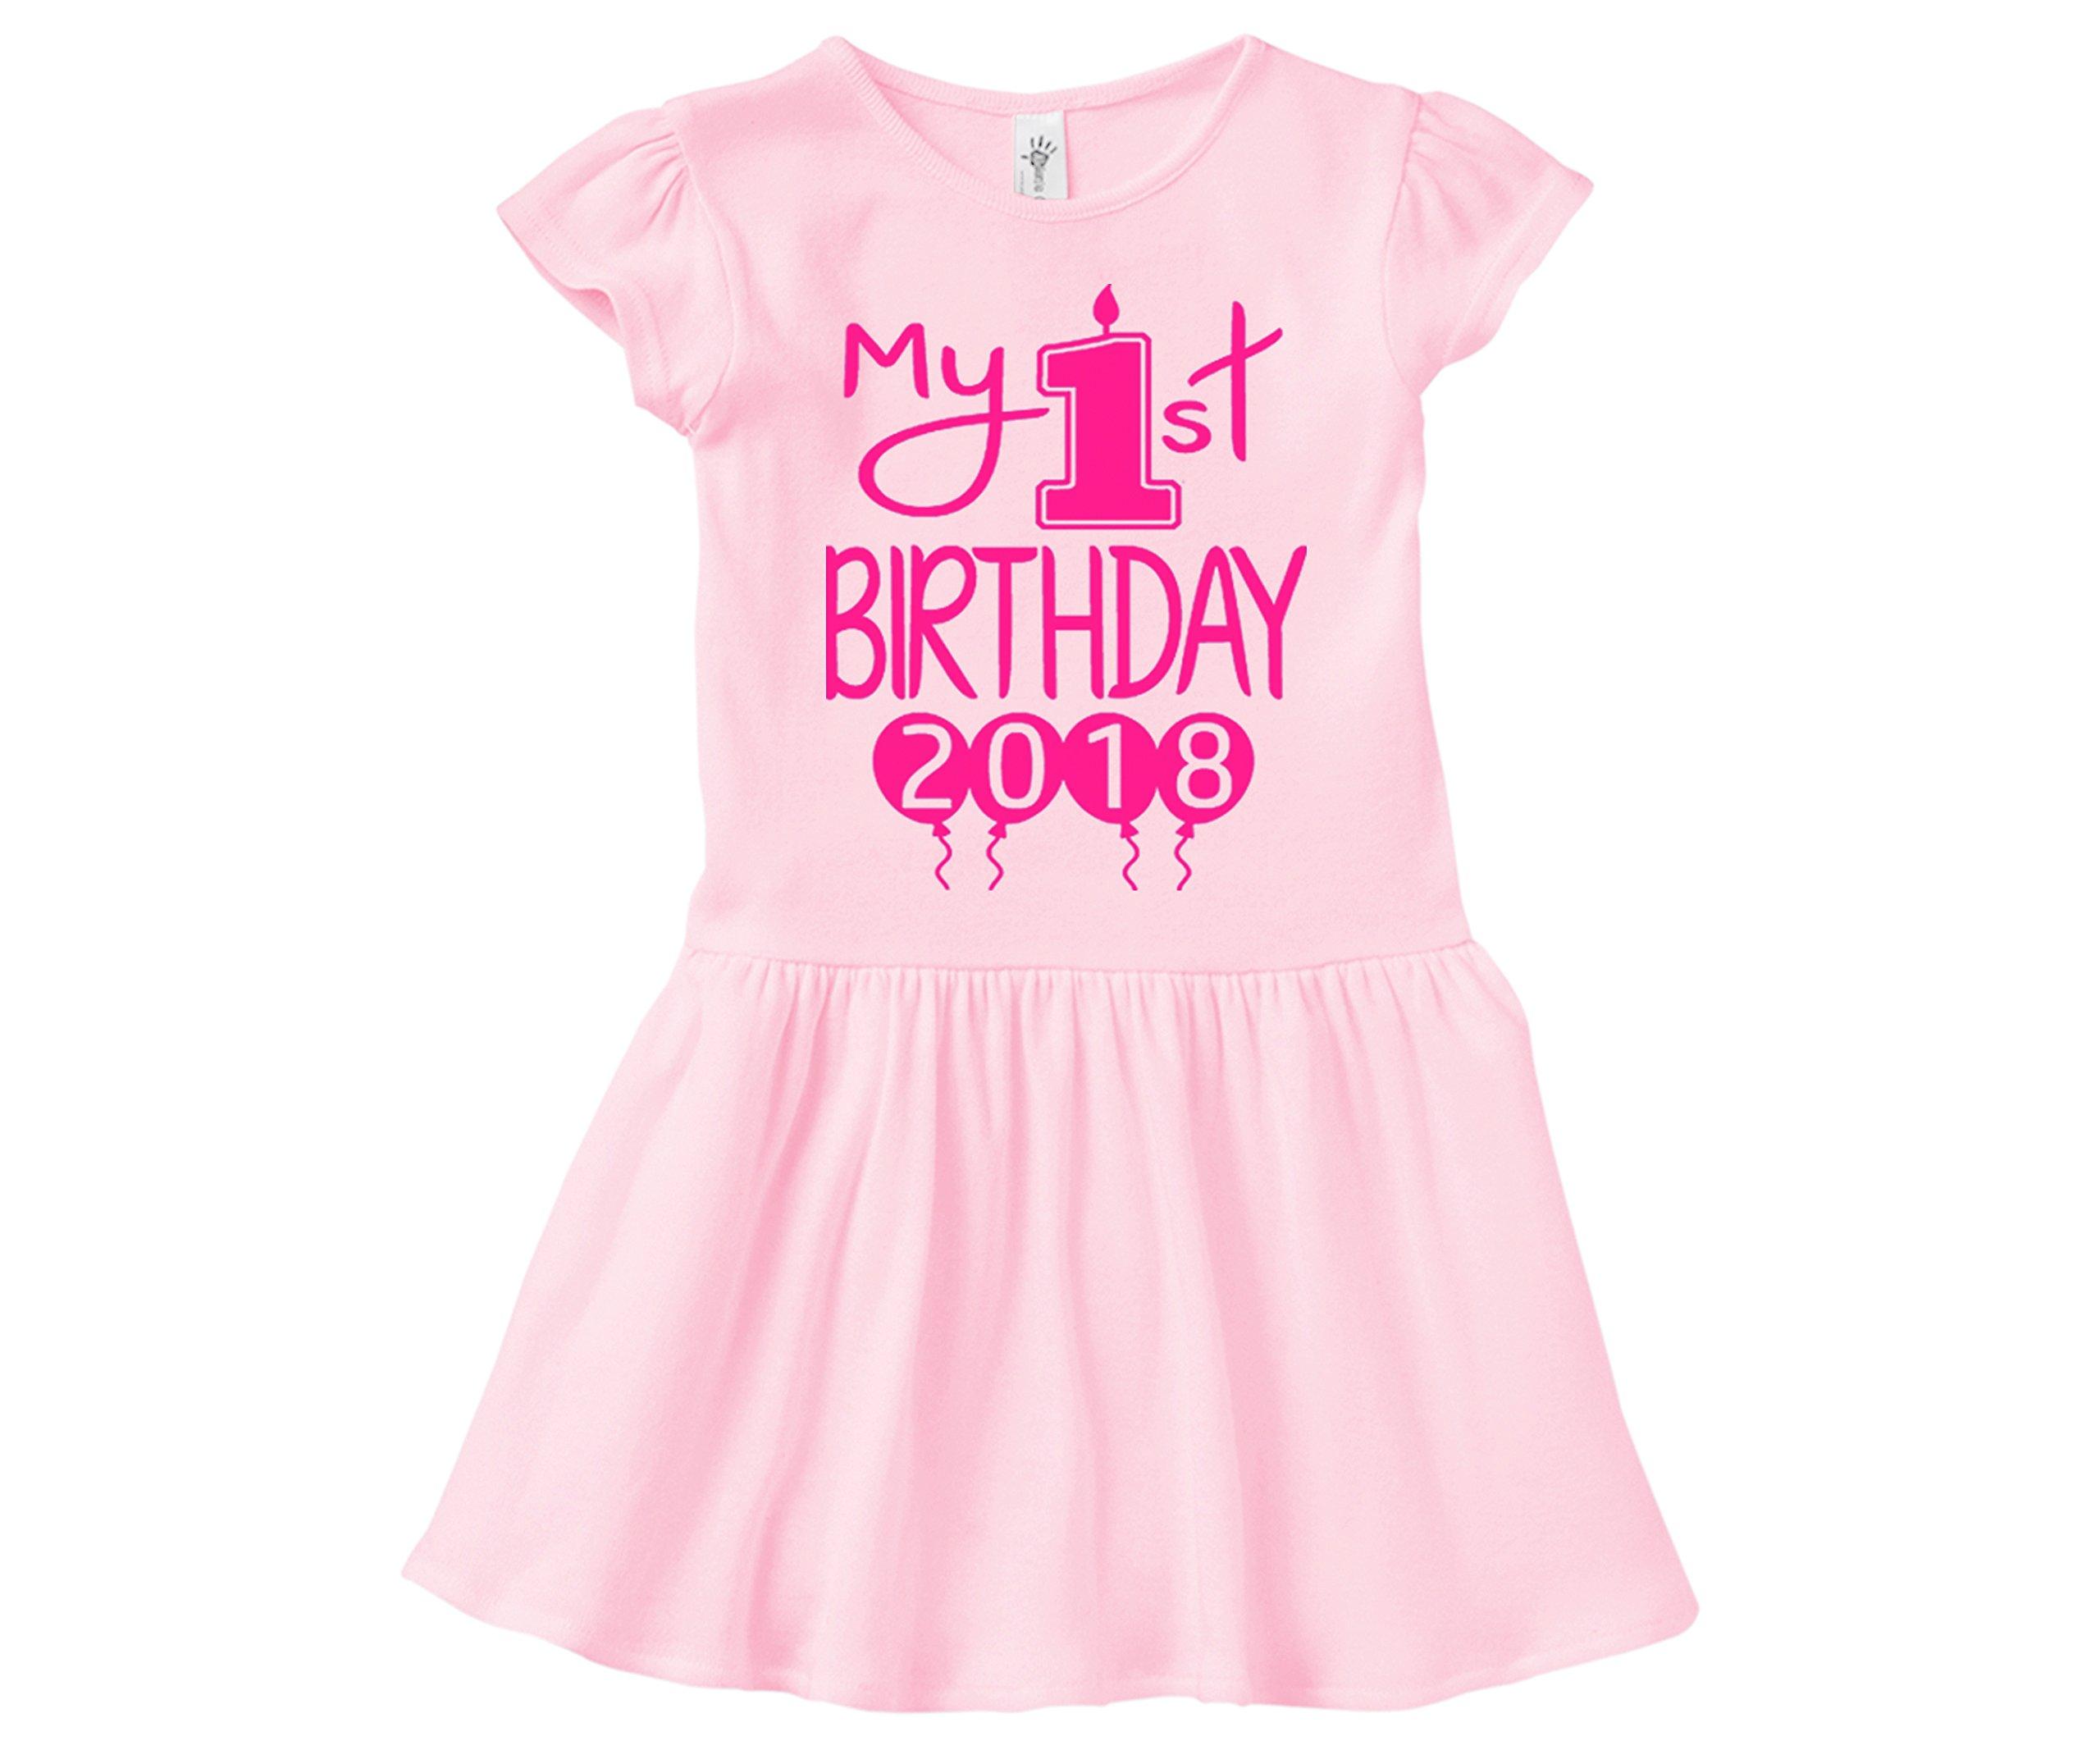 Aiden's Corner Baby Girl First Birthday Dress - My First Birthday 2018 Dress (18 Months, Pink Pink)